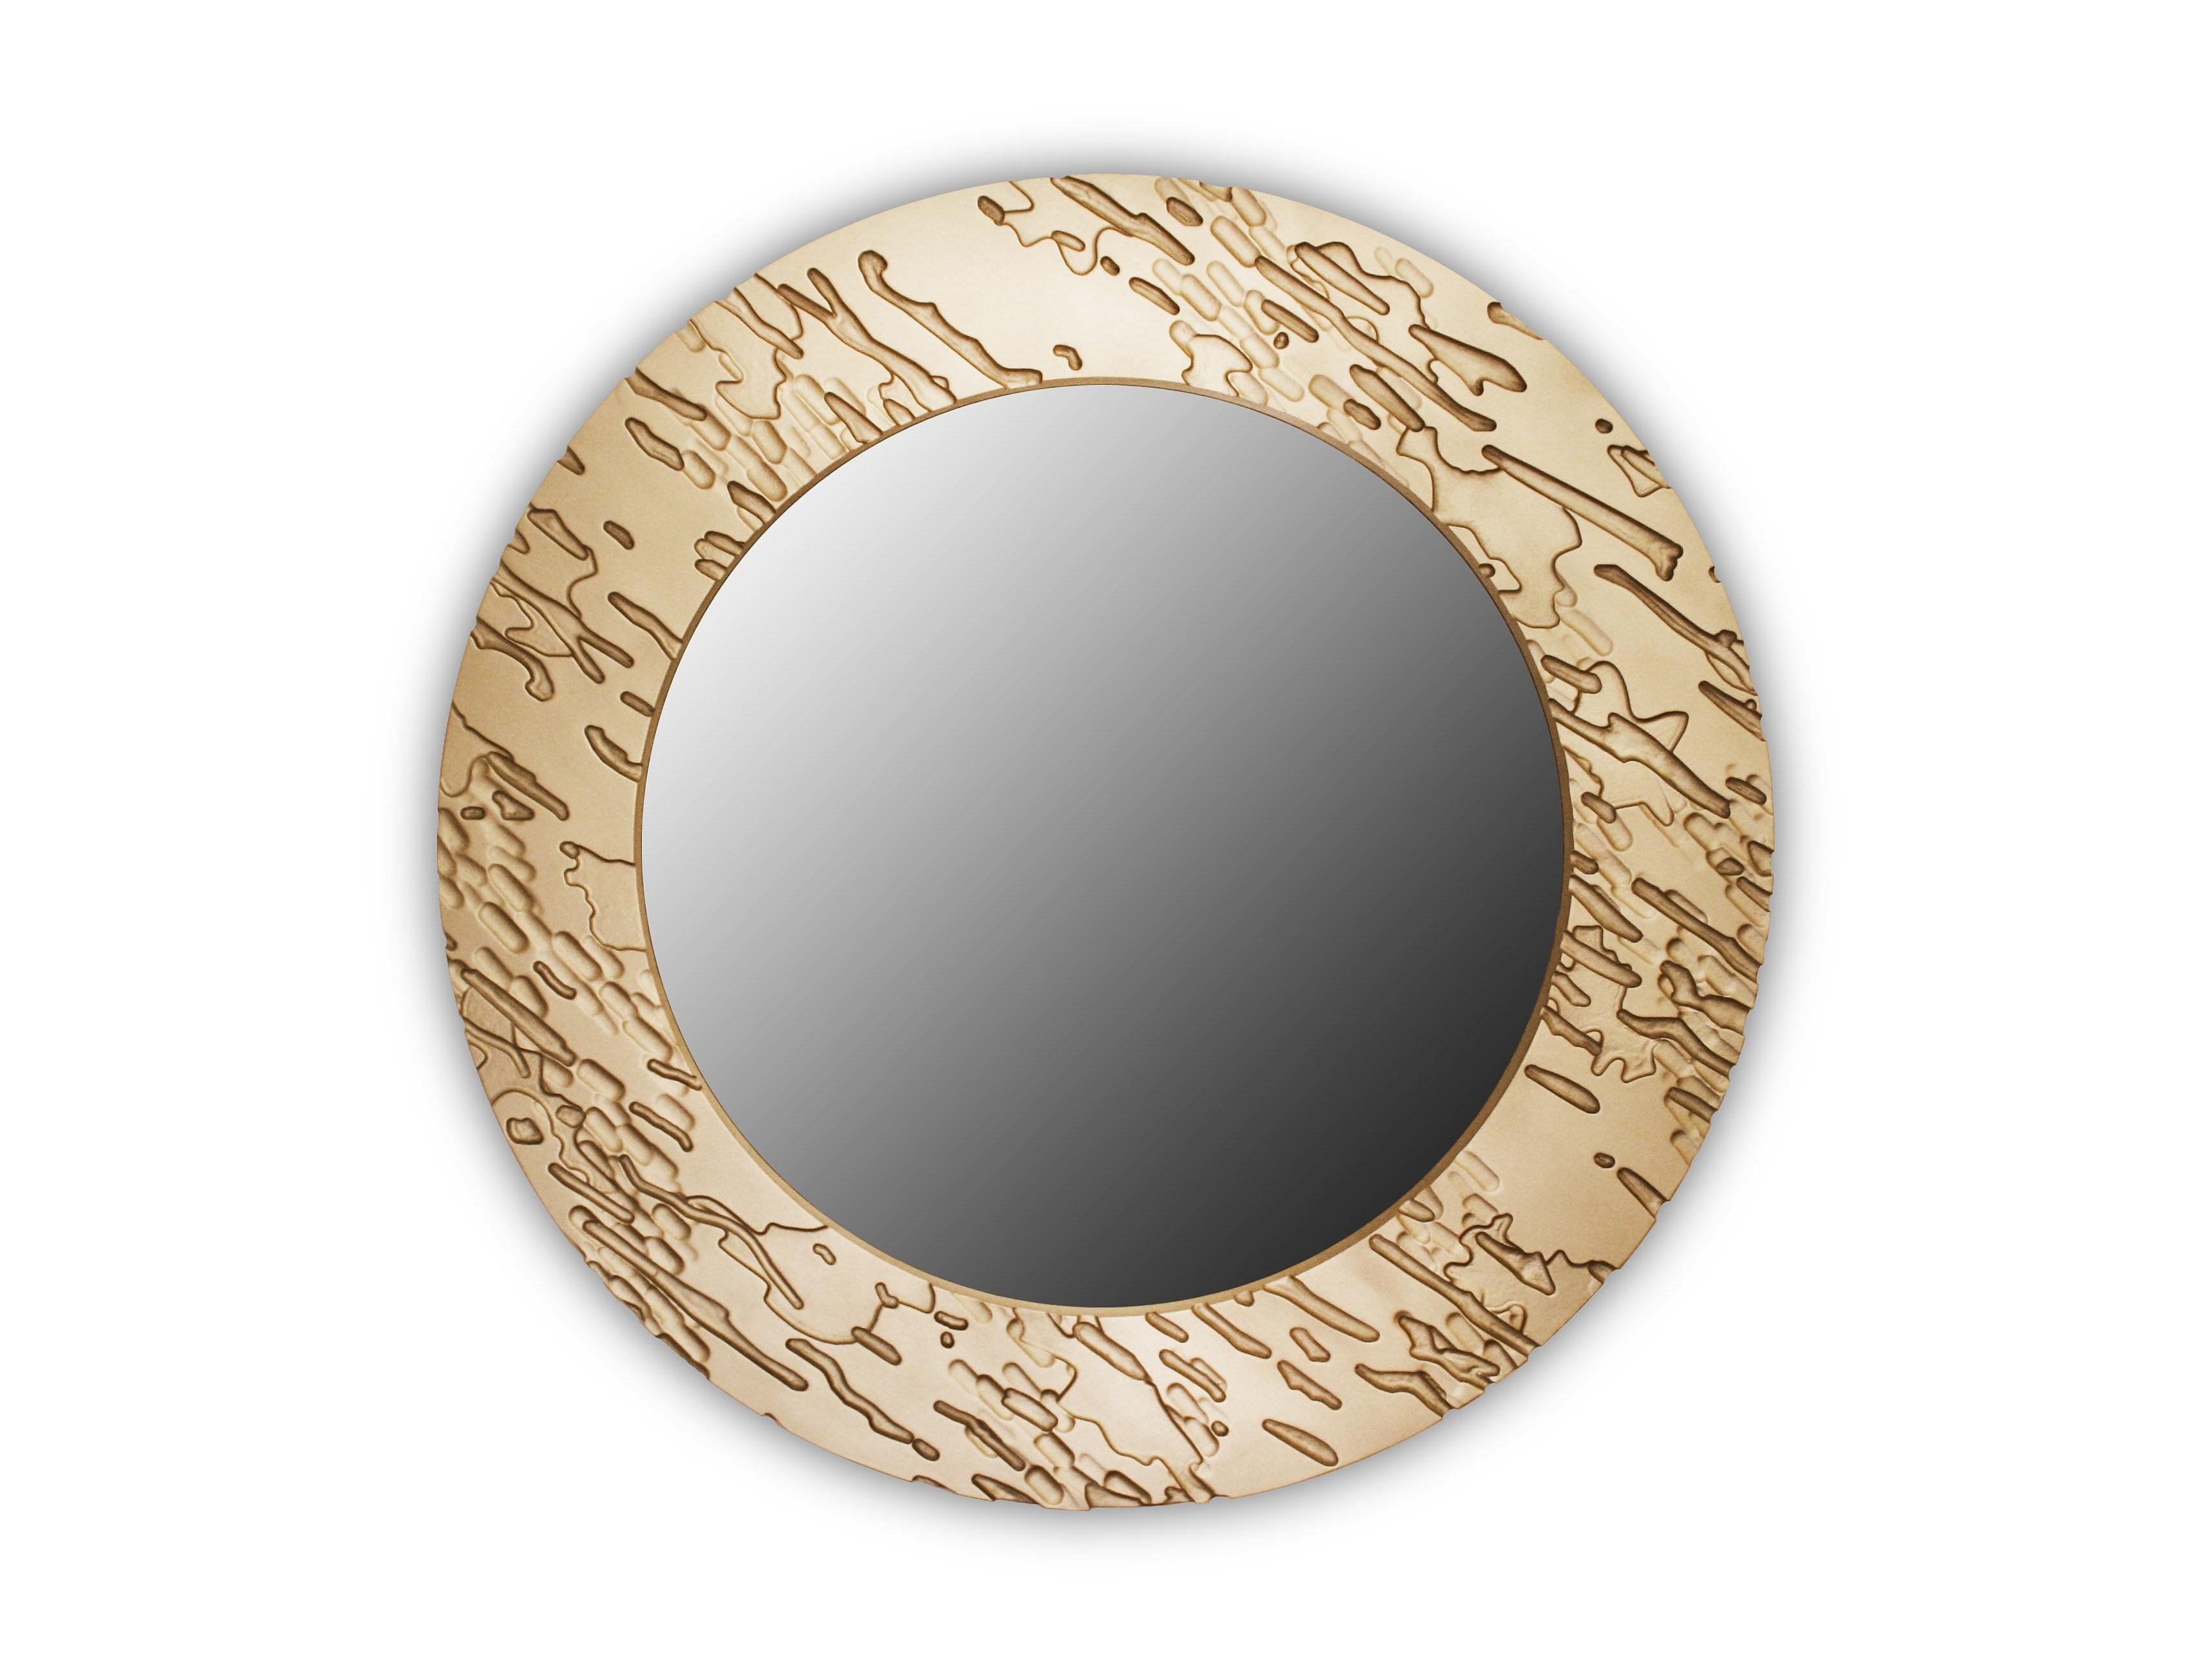 Зеркало Fashion rizoНастенные зеркала<br>Патина.&amp;lt;div&amp;gt;Возможен заказ изделий размерами 90 см, 75 см, 65 см&amp;lt;/div&amp;gt;<br><br>Material: Дерево<br>Height см: 3.6<br>Diameter см: 90